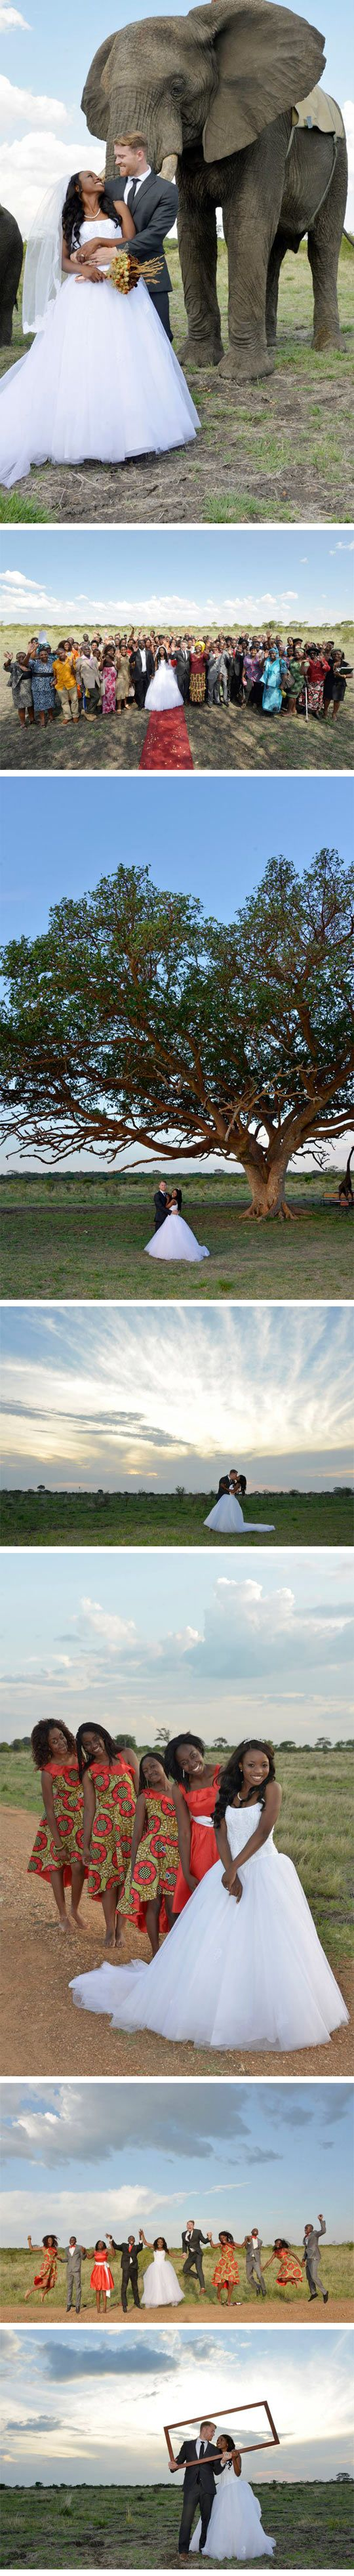 cool-African-wedding-happy-couple